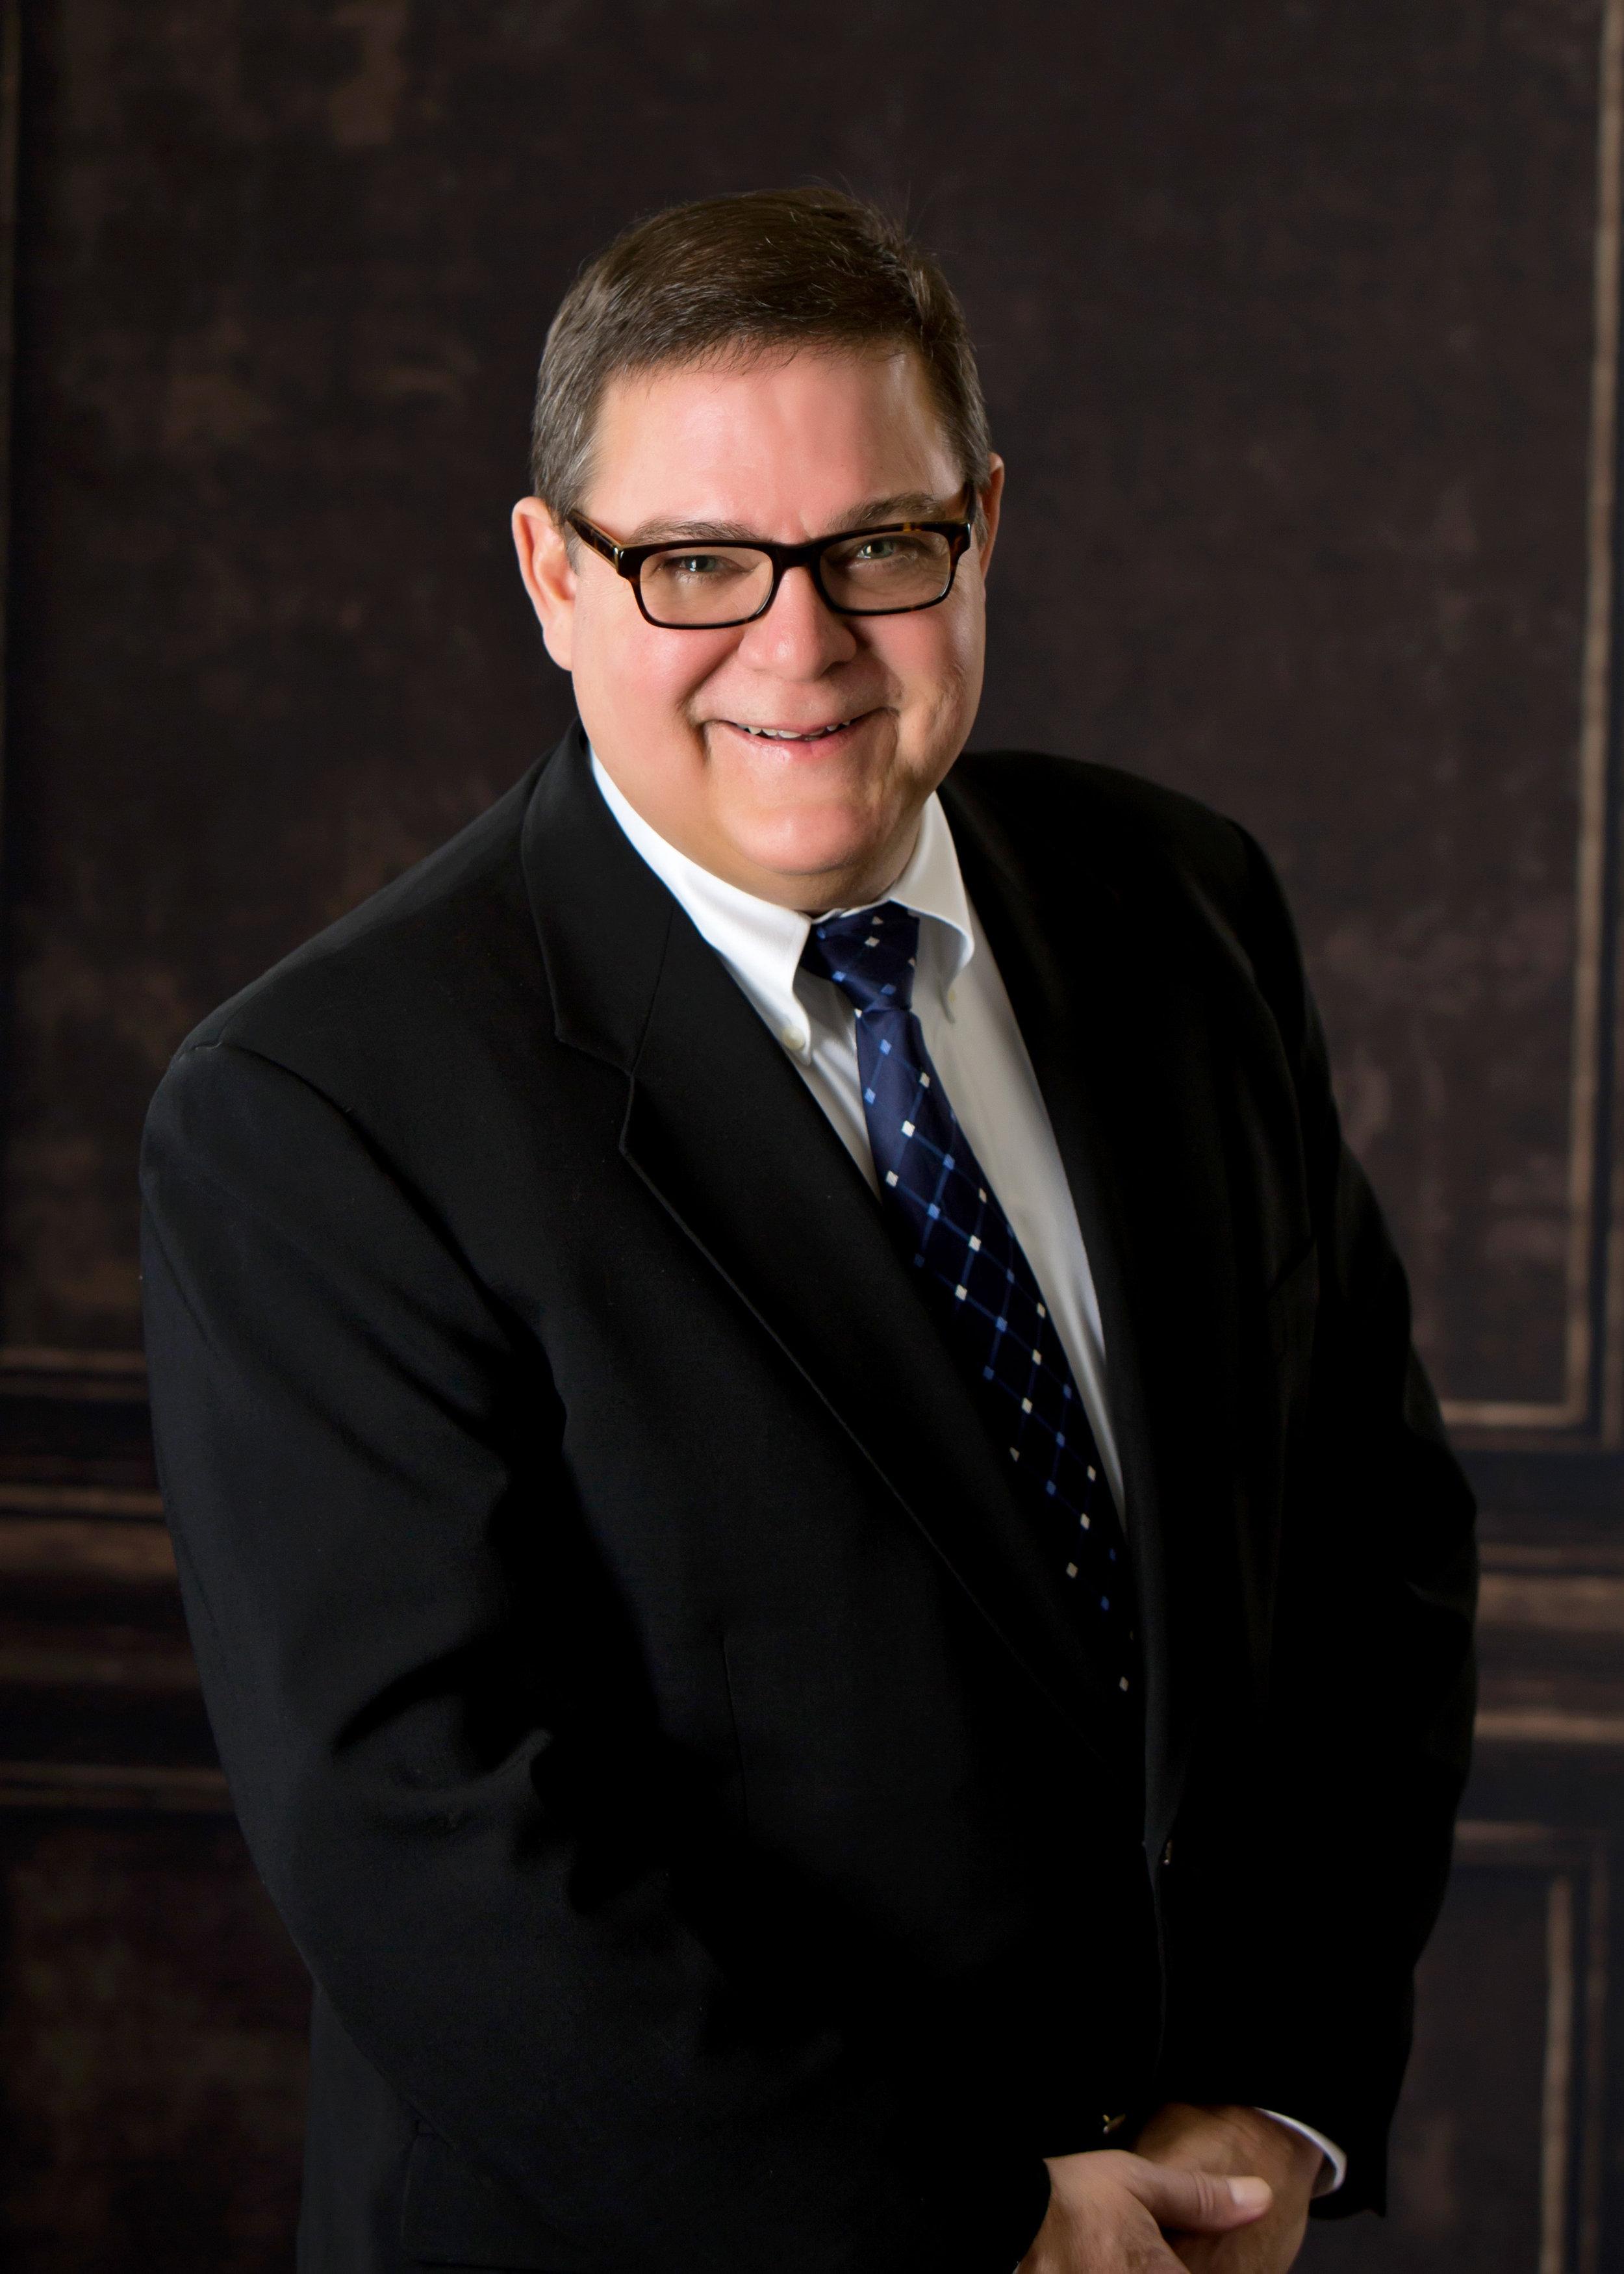 John Heisserer, Attorney - jheisserer@capelawfirm.com